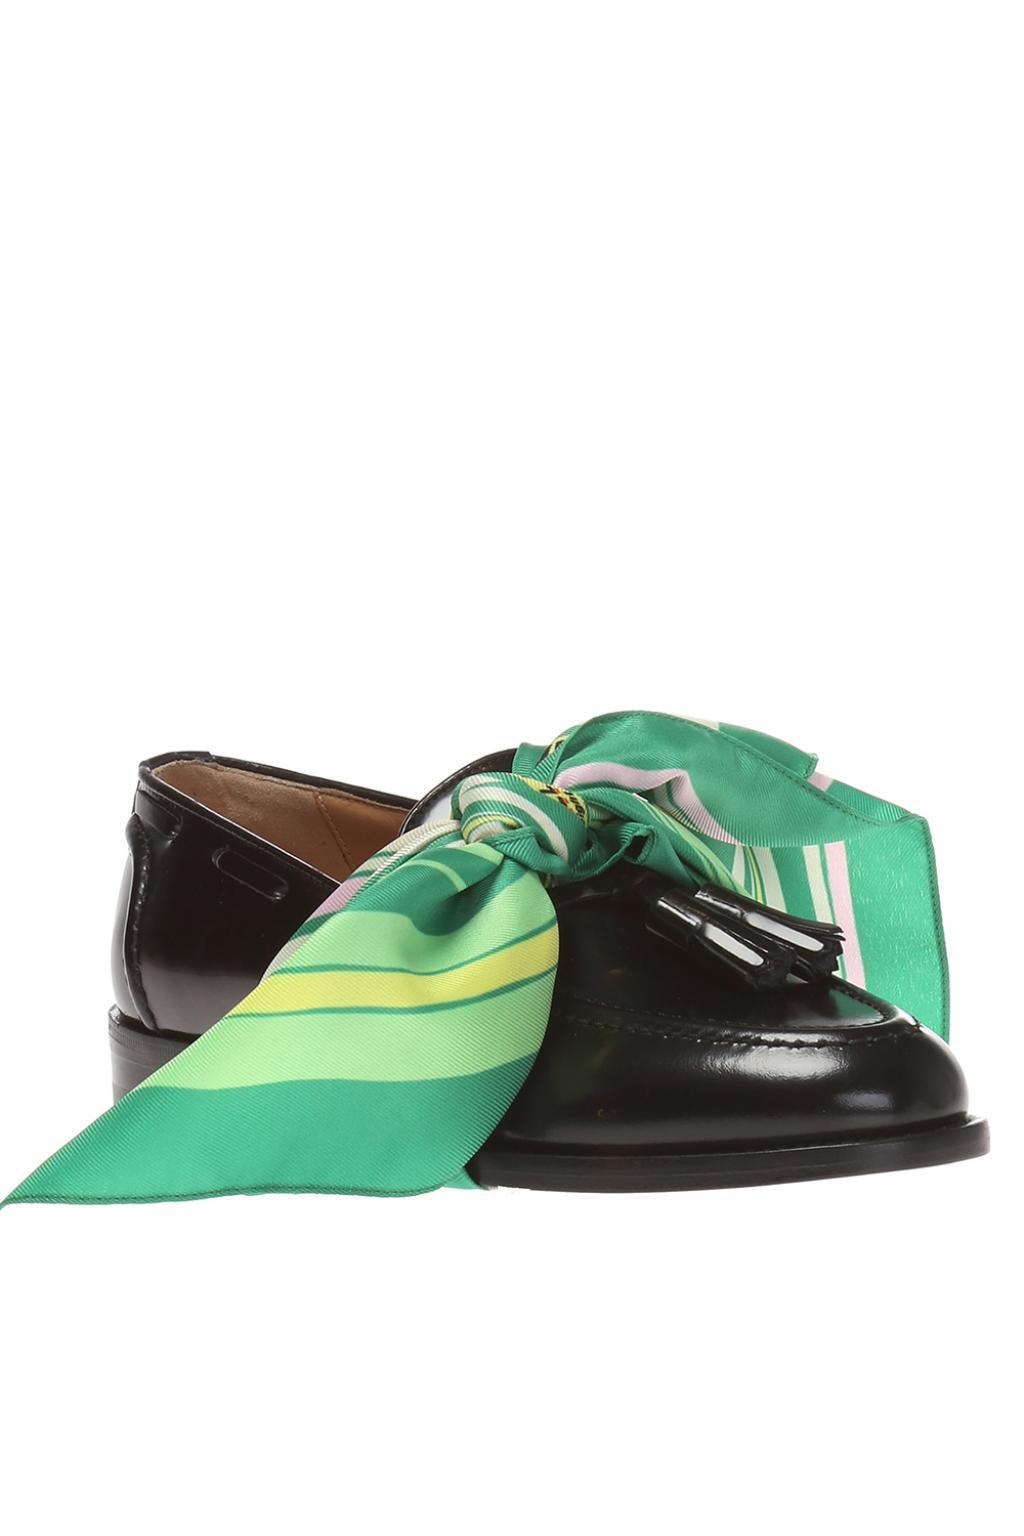 Off-White c o Virgil Abloh - Black Slip-on Shoes - Lyst. View fullscreen 3e025a5c9